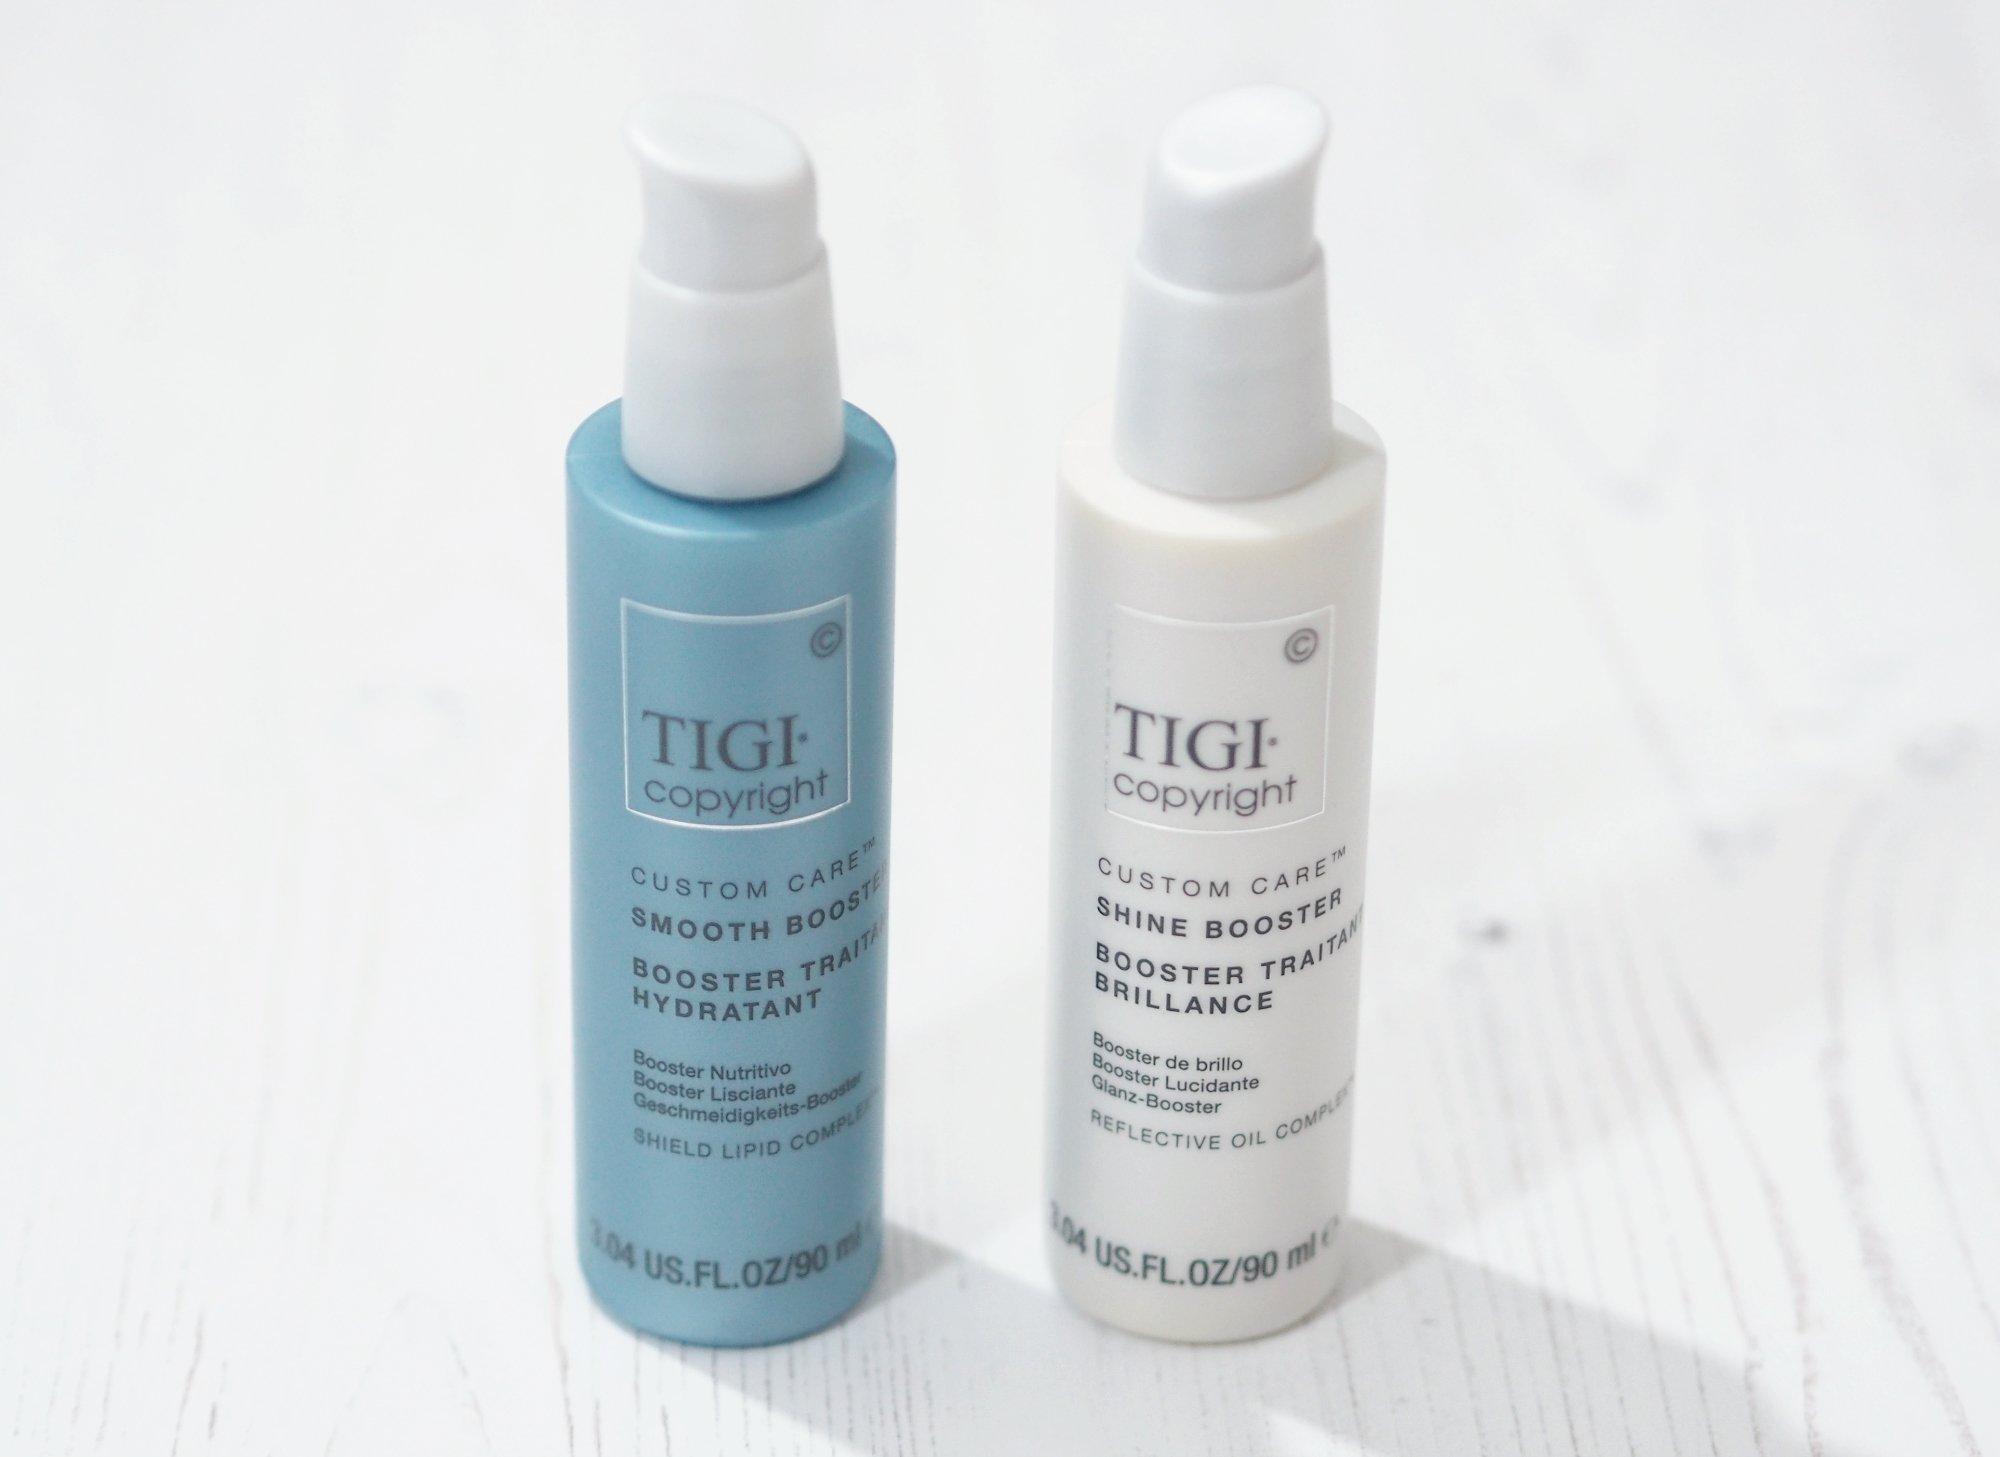 TIGI Copyright Custom Care Smooth Booster and Shine Booster